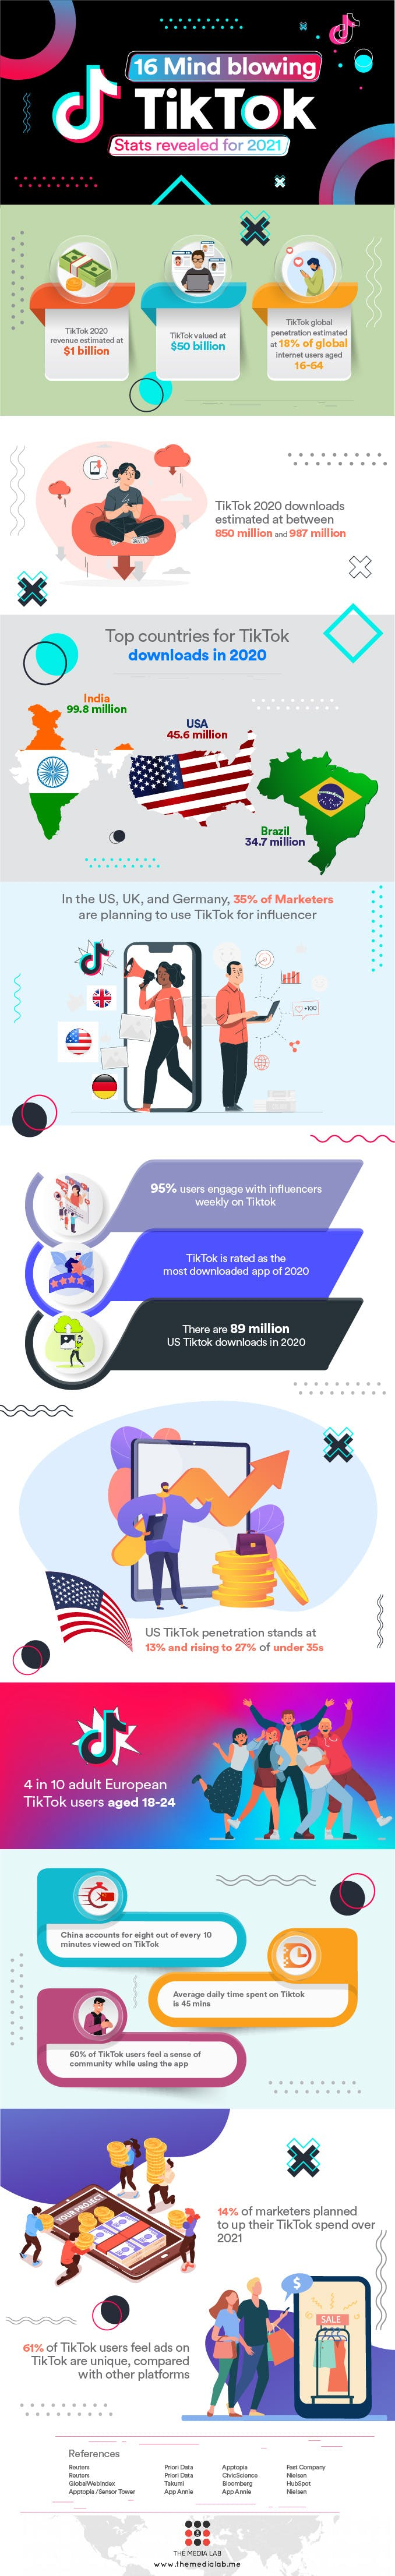 infographic for TikTok stats 2021